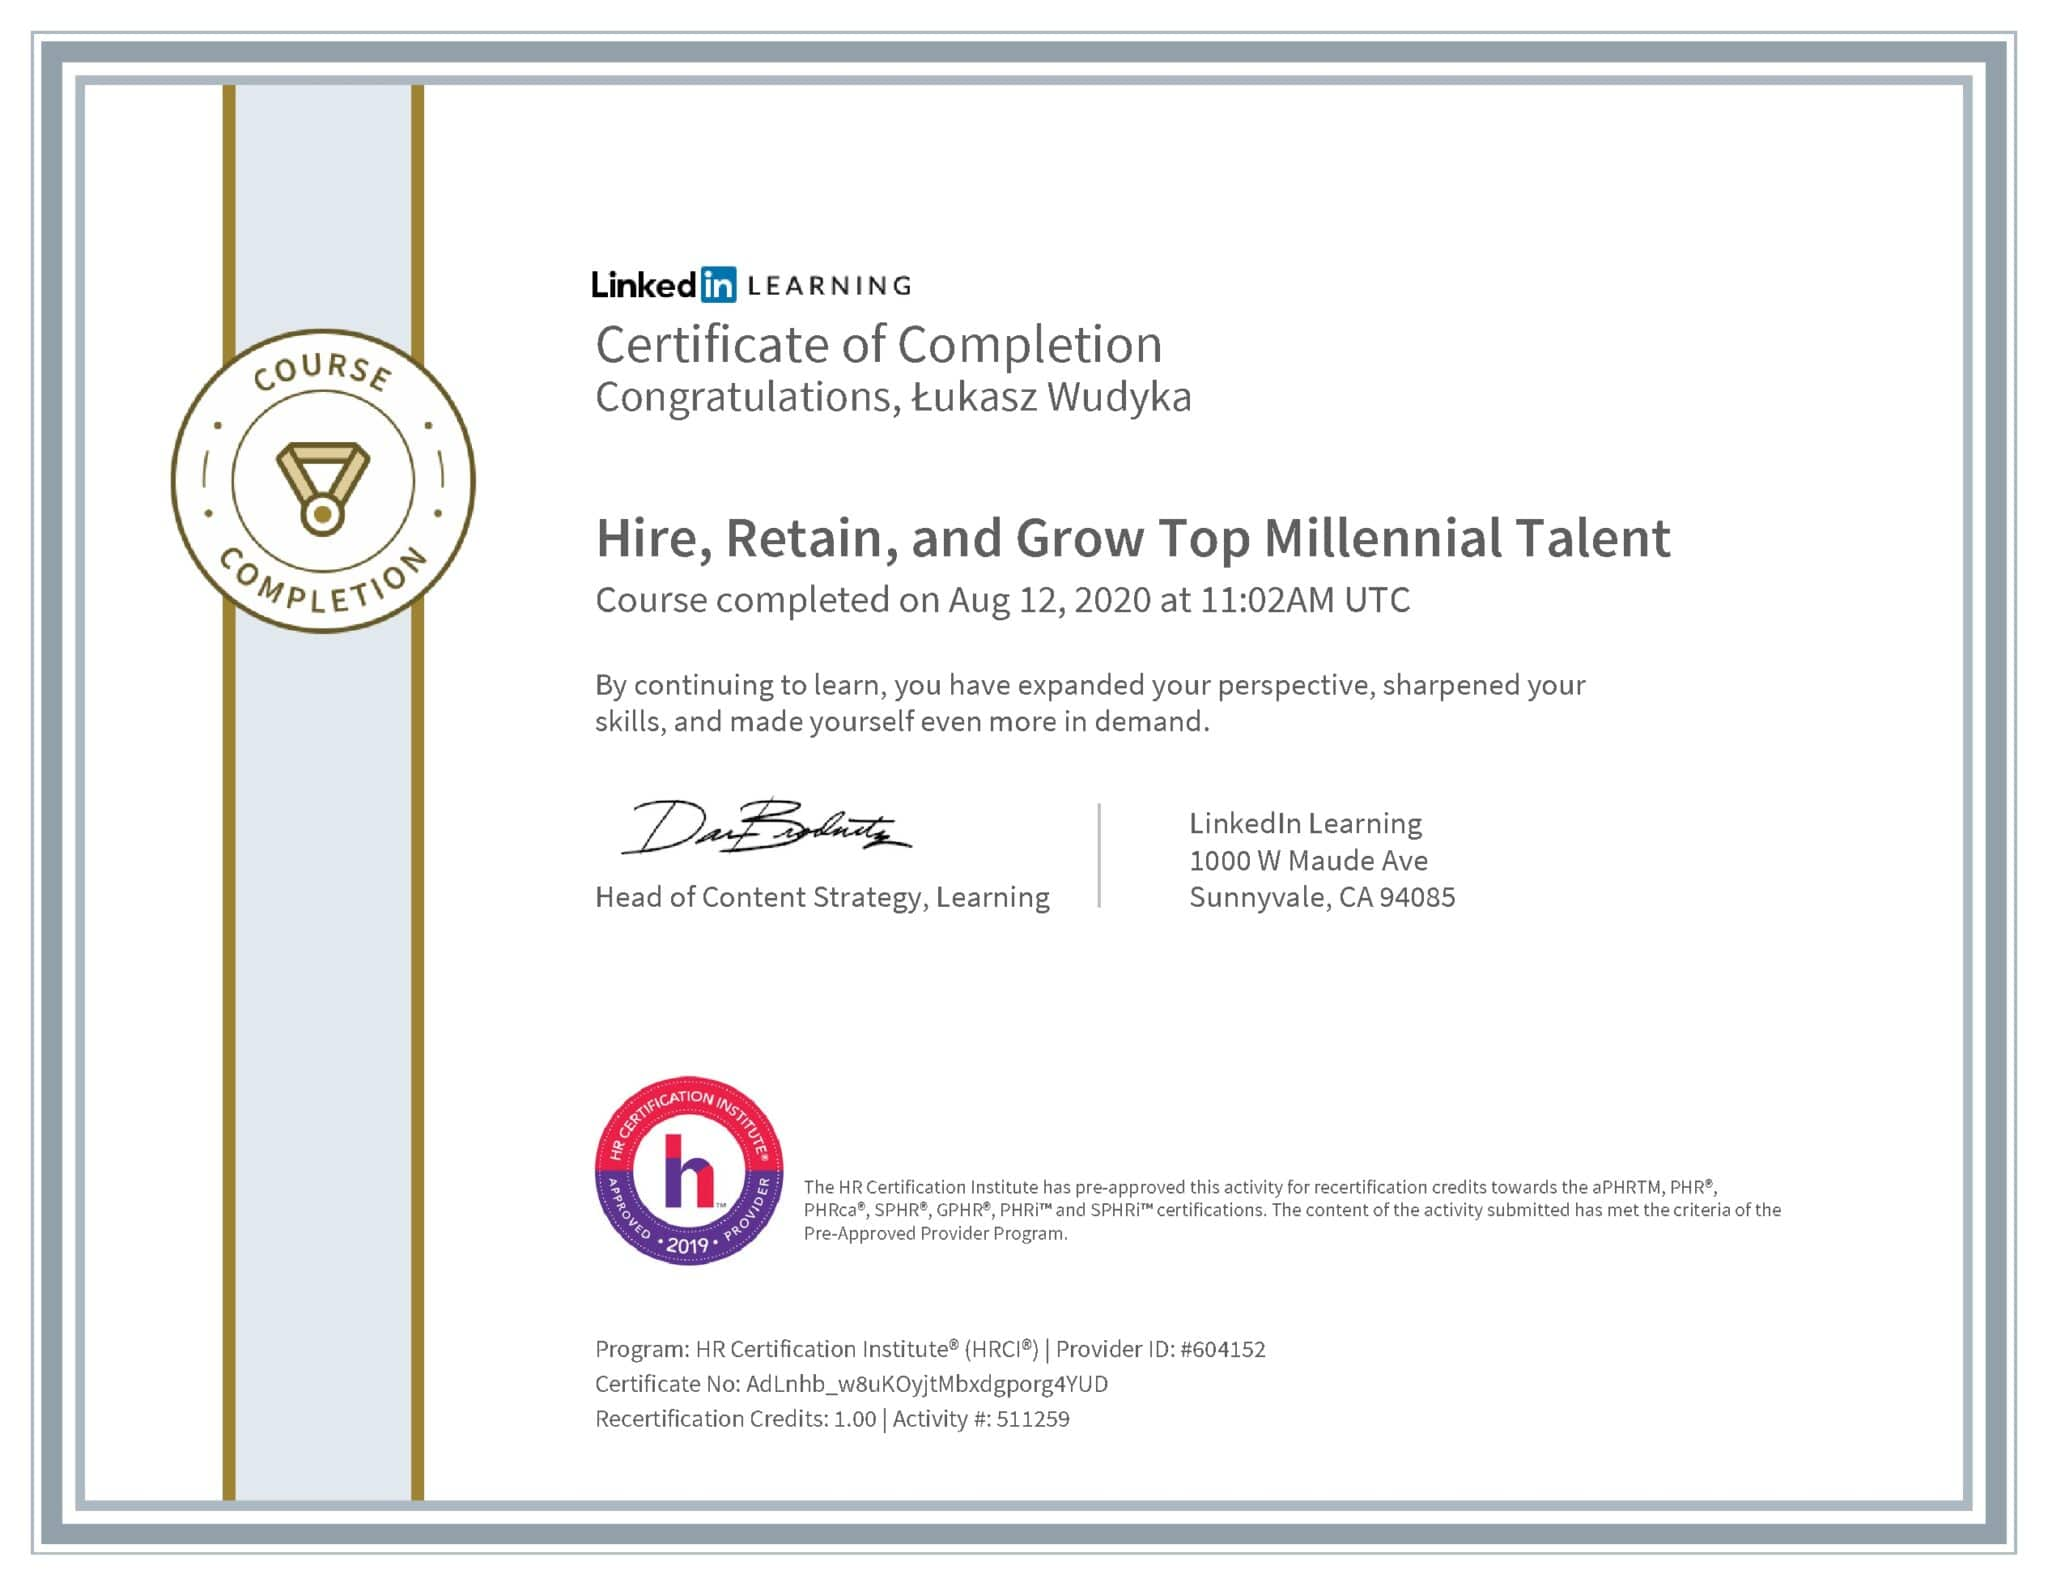 Łukasz Wudyka certyfikat LinkedIn Hire, Retain, and Grow Top Millennial Talent HRCI